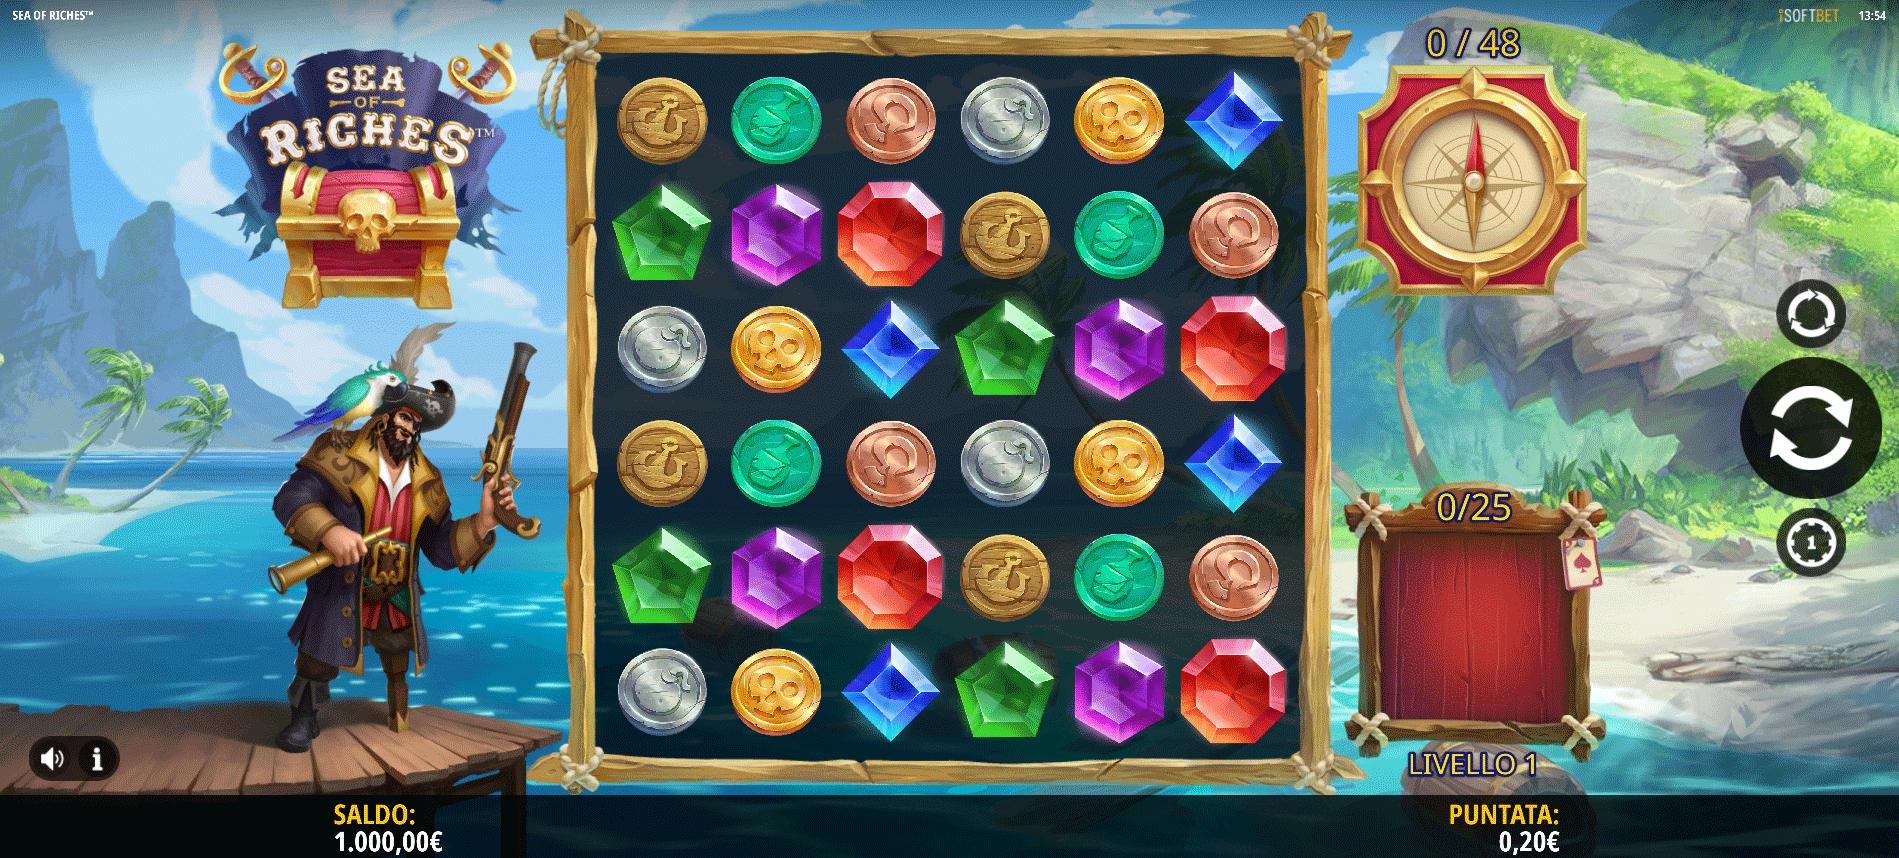 Slot Sea of Riches